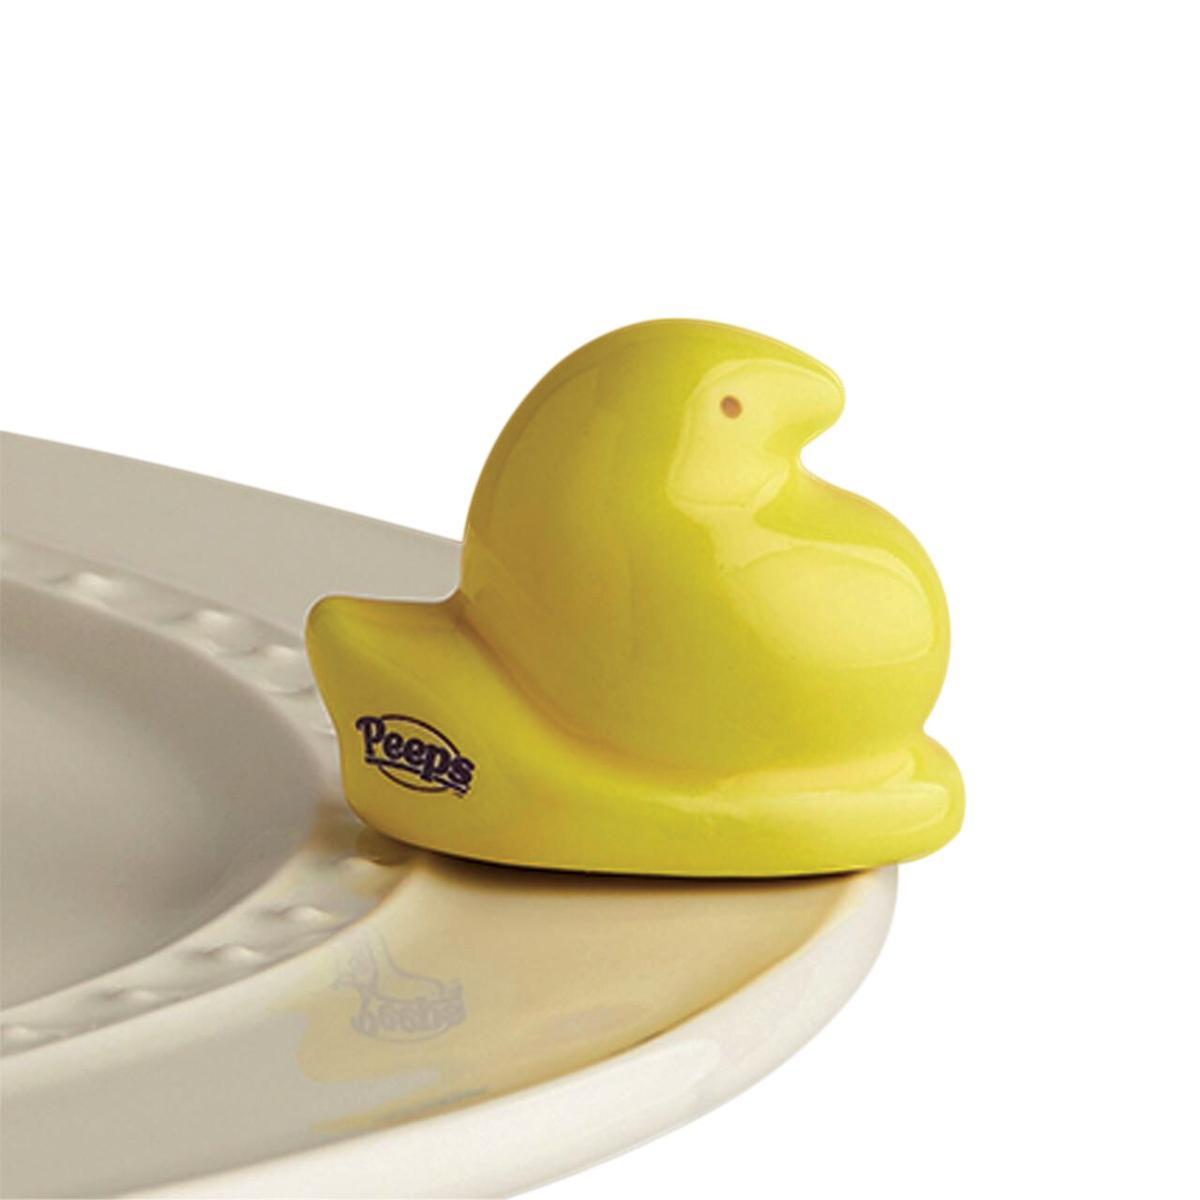 0034719_yellow-peeps-chick-mini-by-nora-fleming.jpg